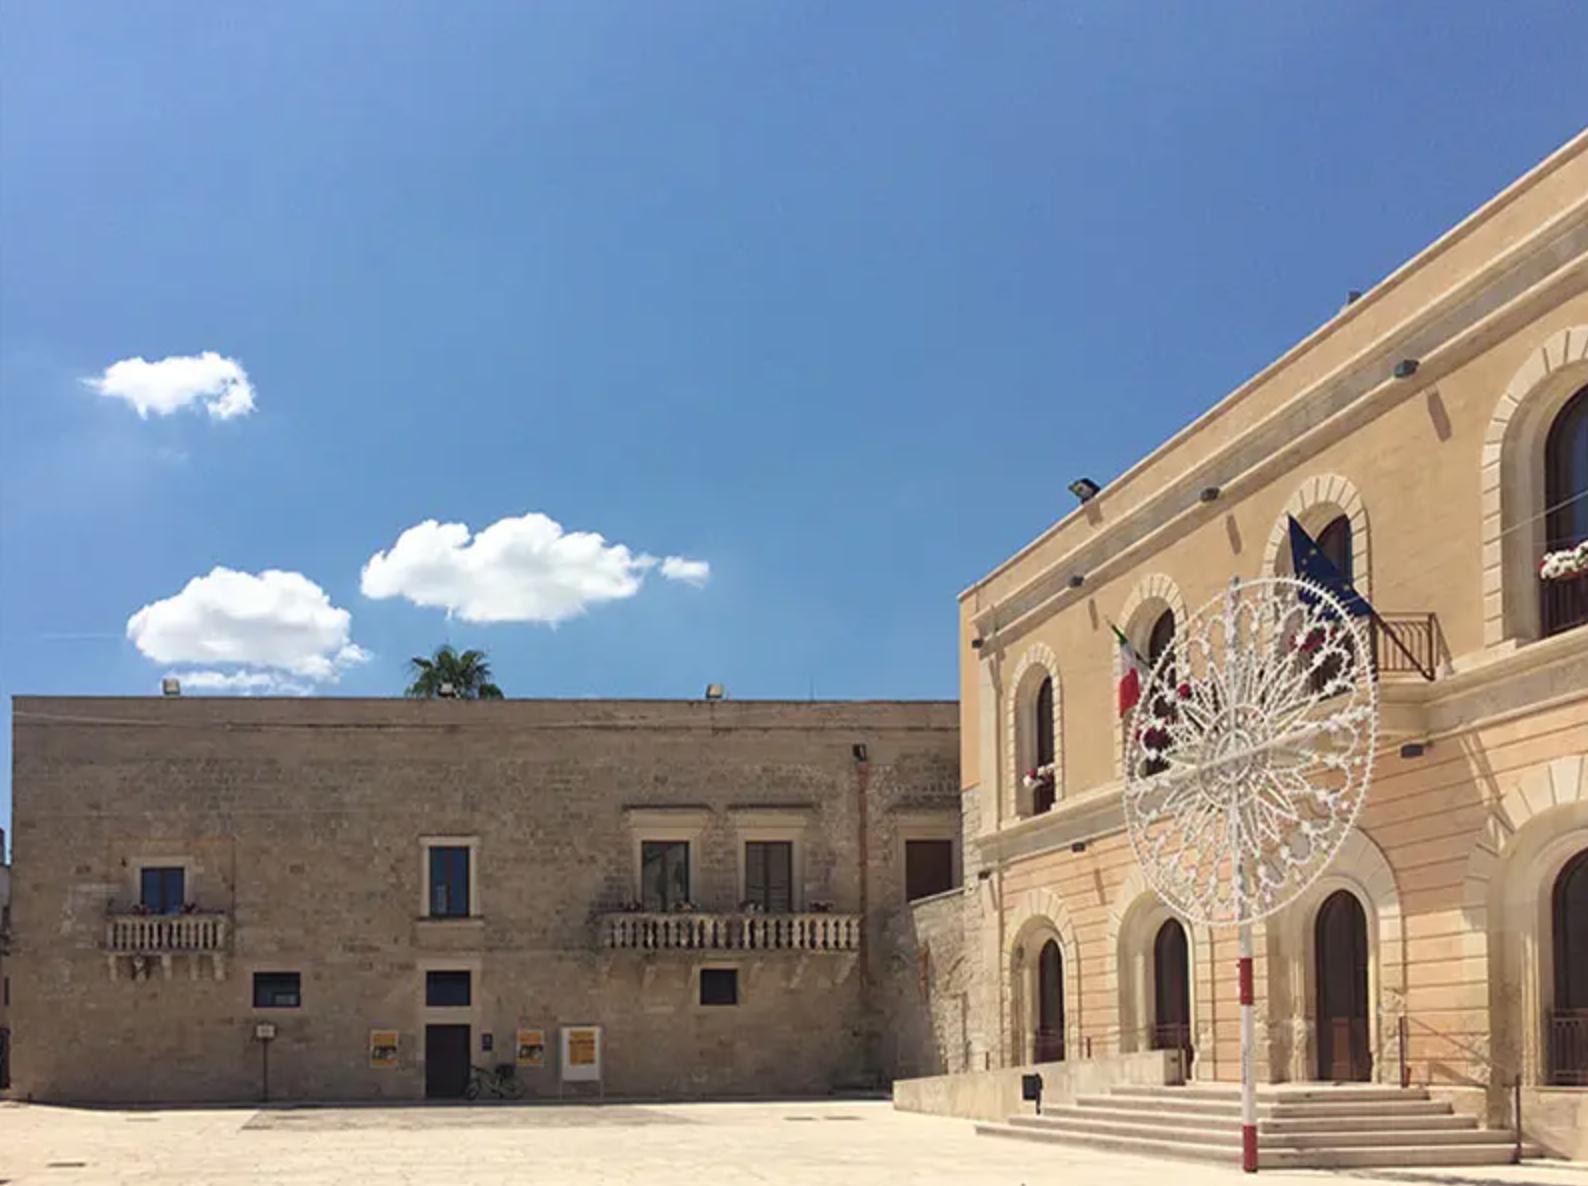 cutrofiano, palazzo filomarini – Laterradipuglia.it